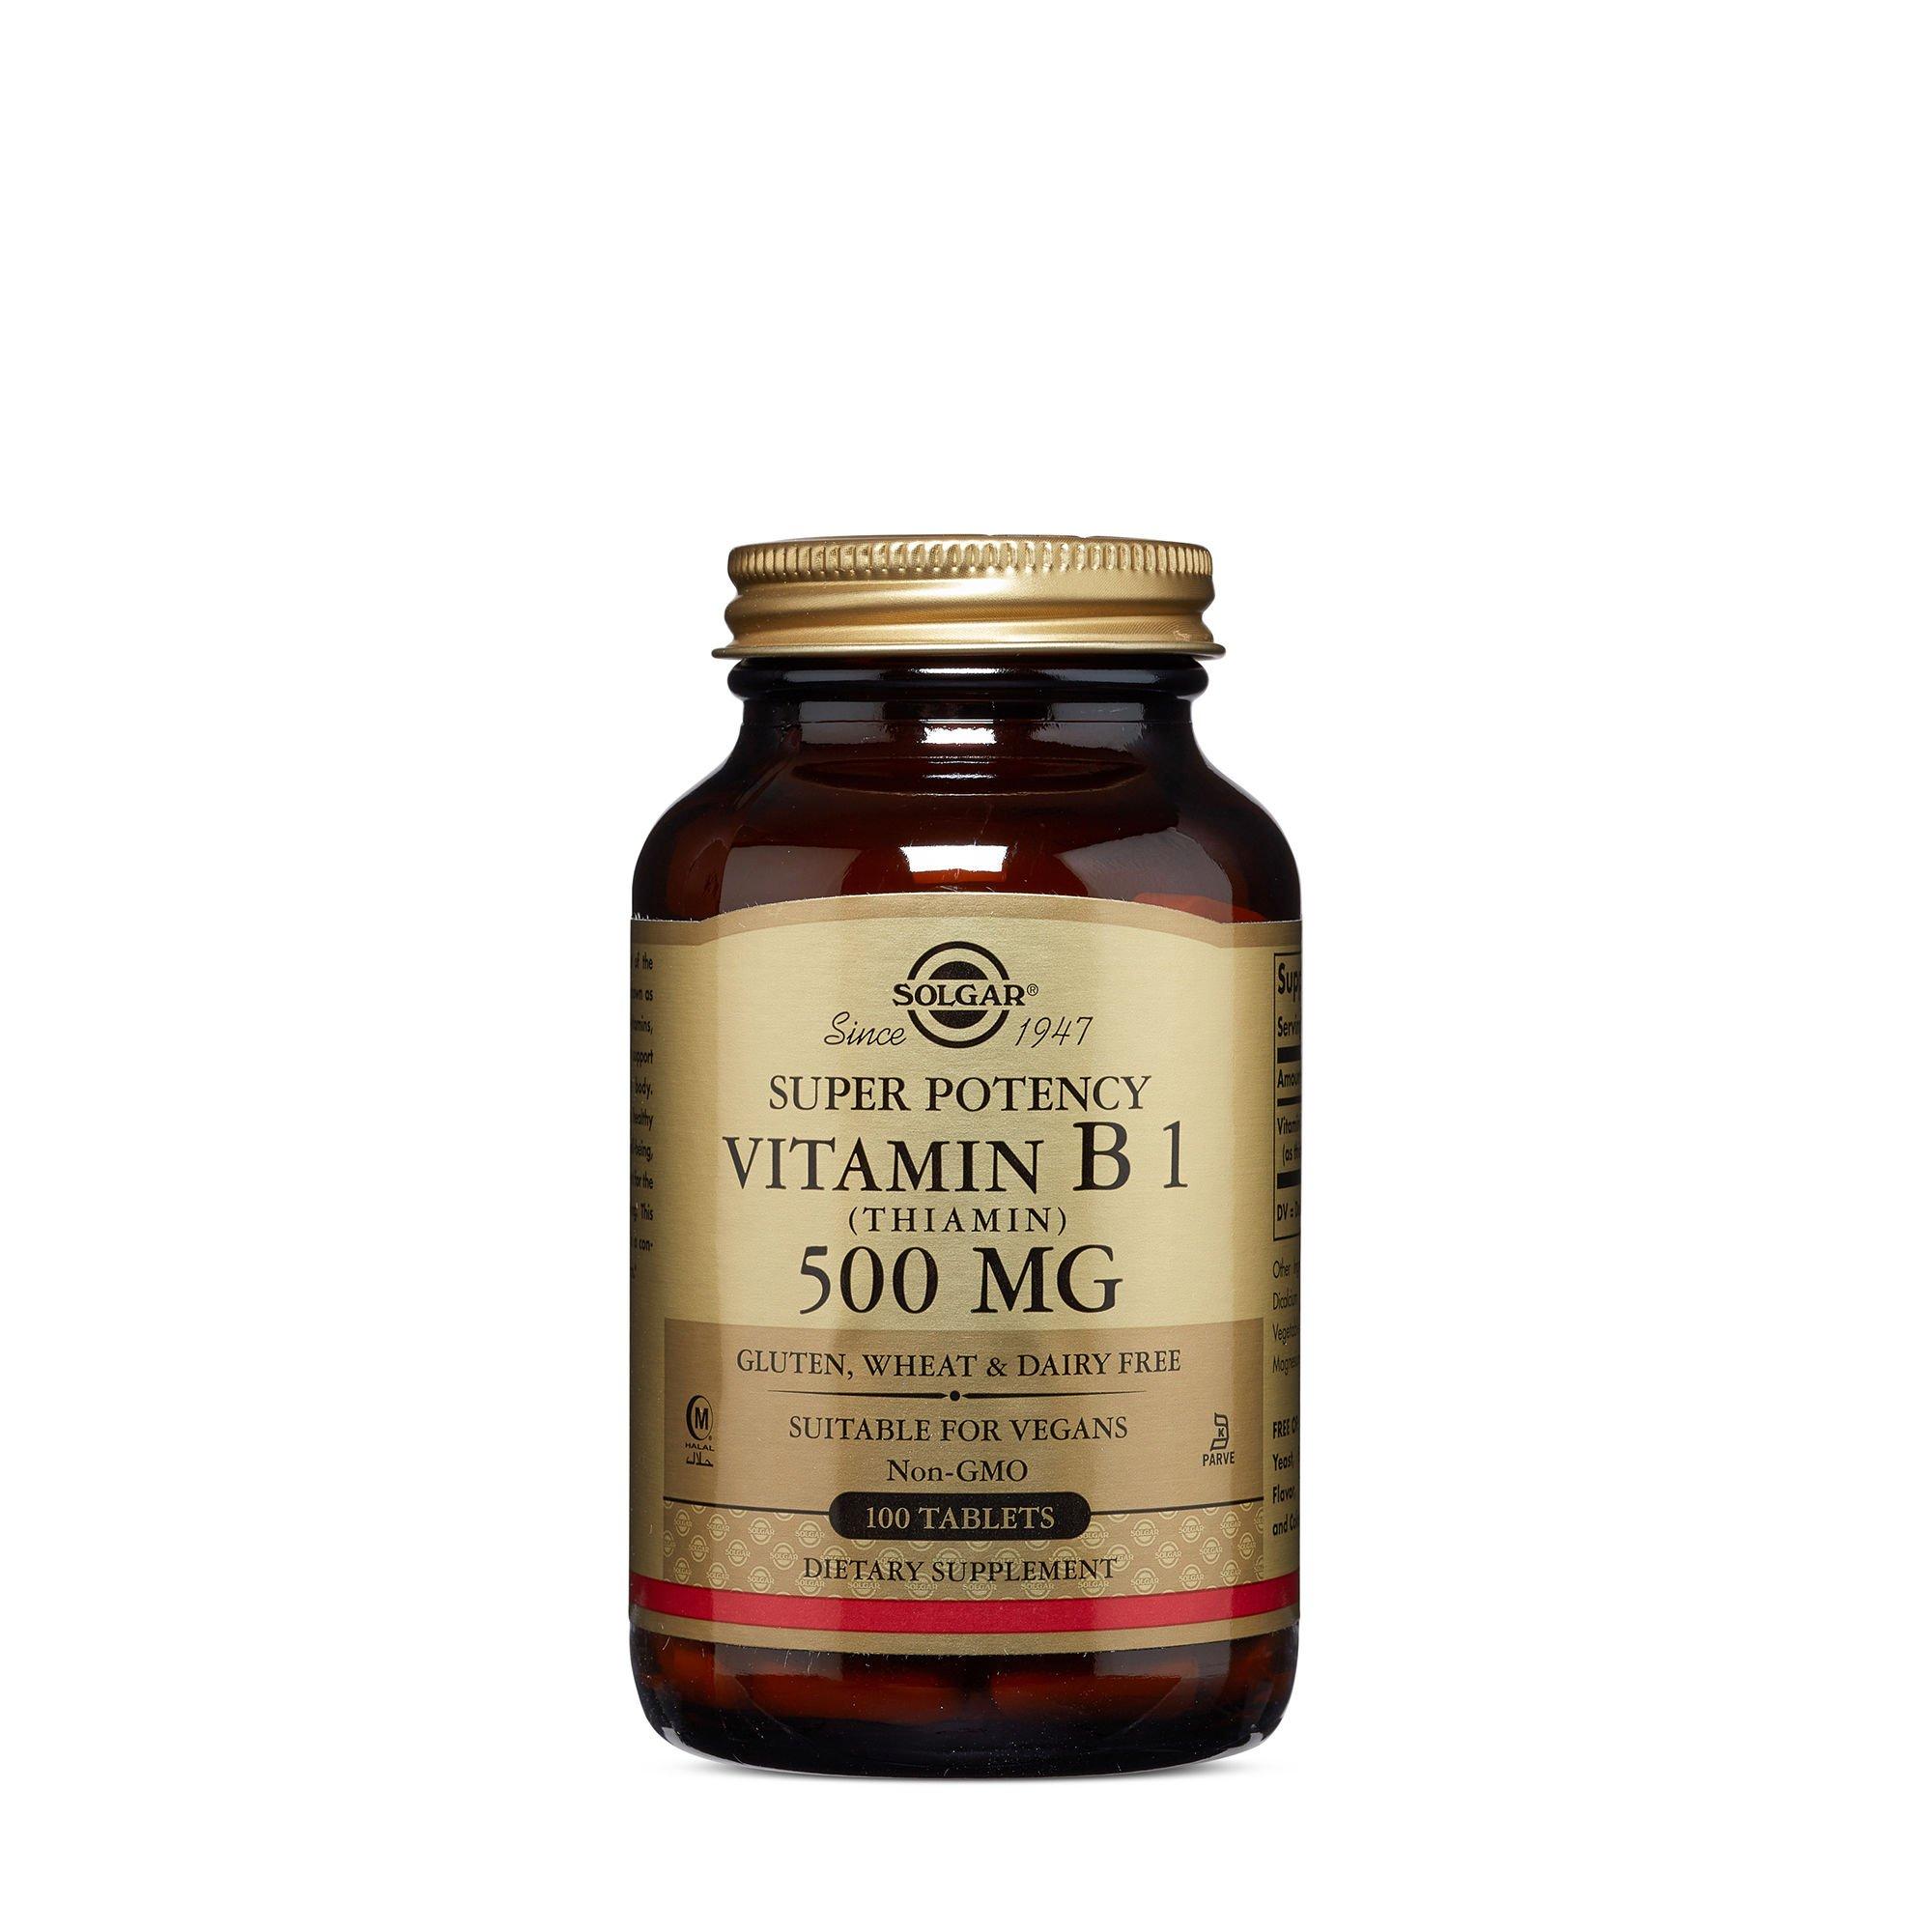 Solgar Super Potency Vitamin B1 Thiamin 500 MG